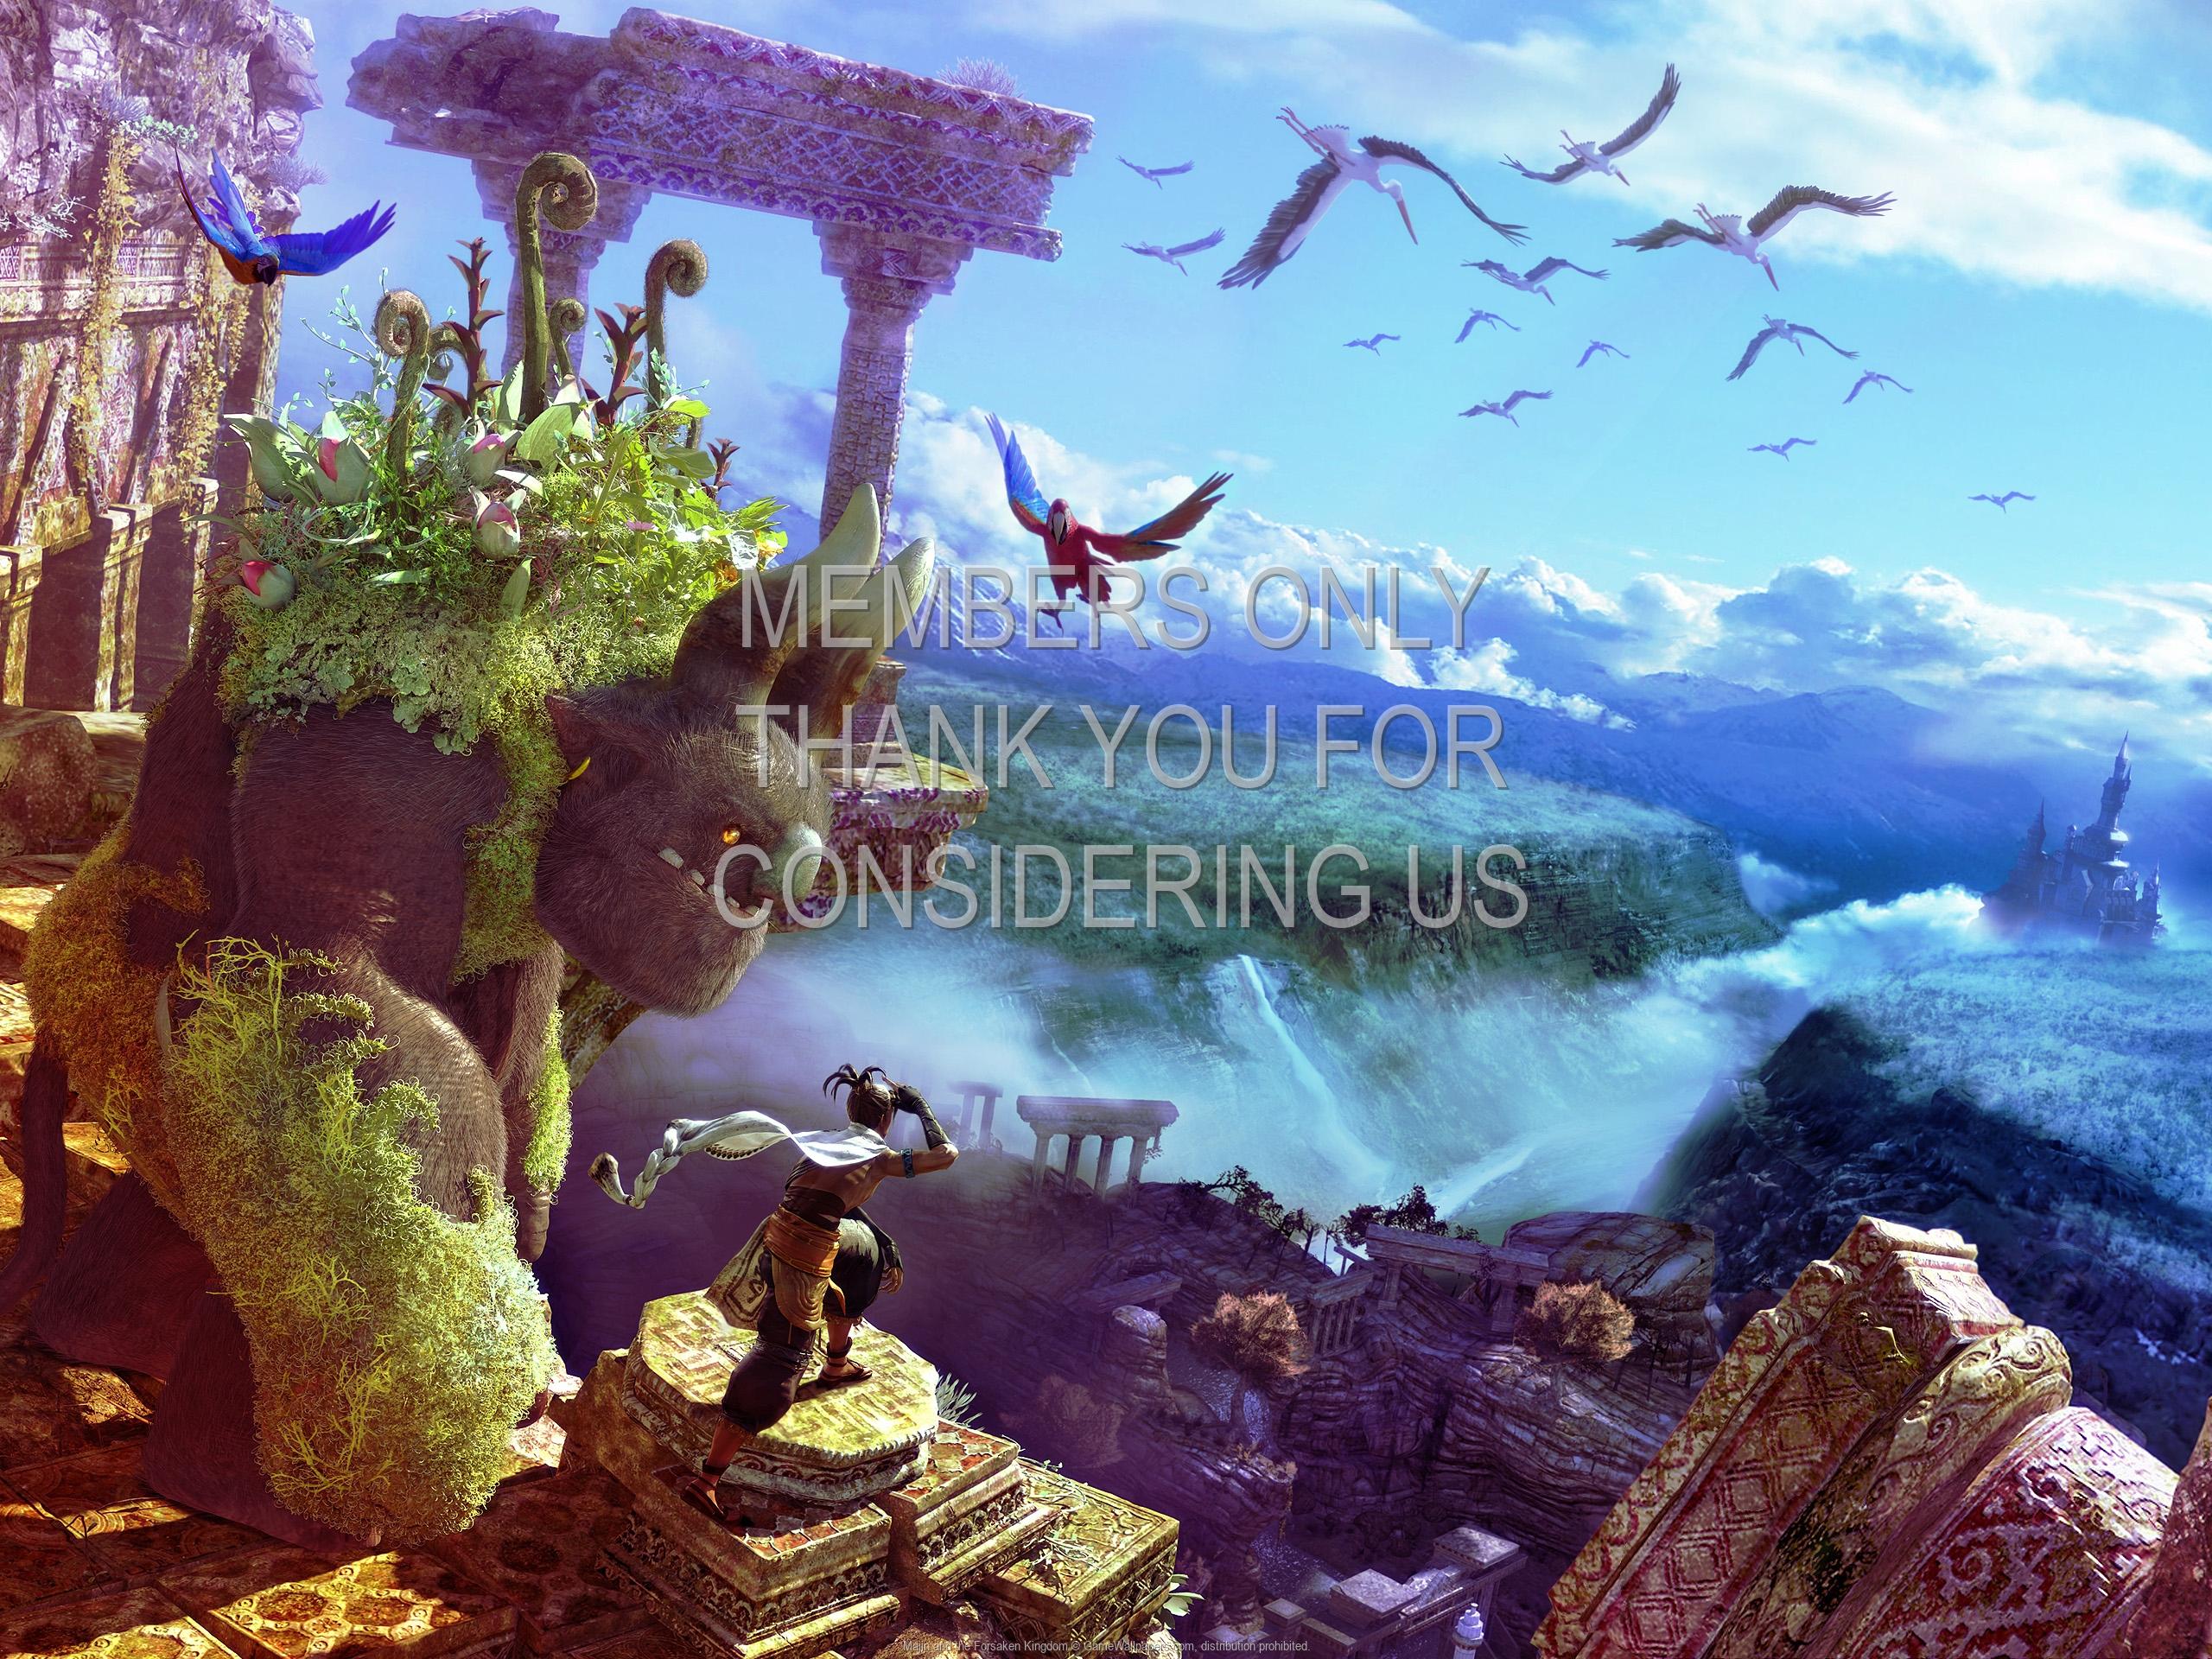 Majin and the Forsaken Kingdom 1920x1080 Handy Hintergrundbild 03